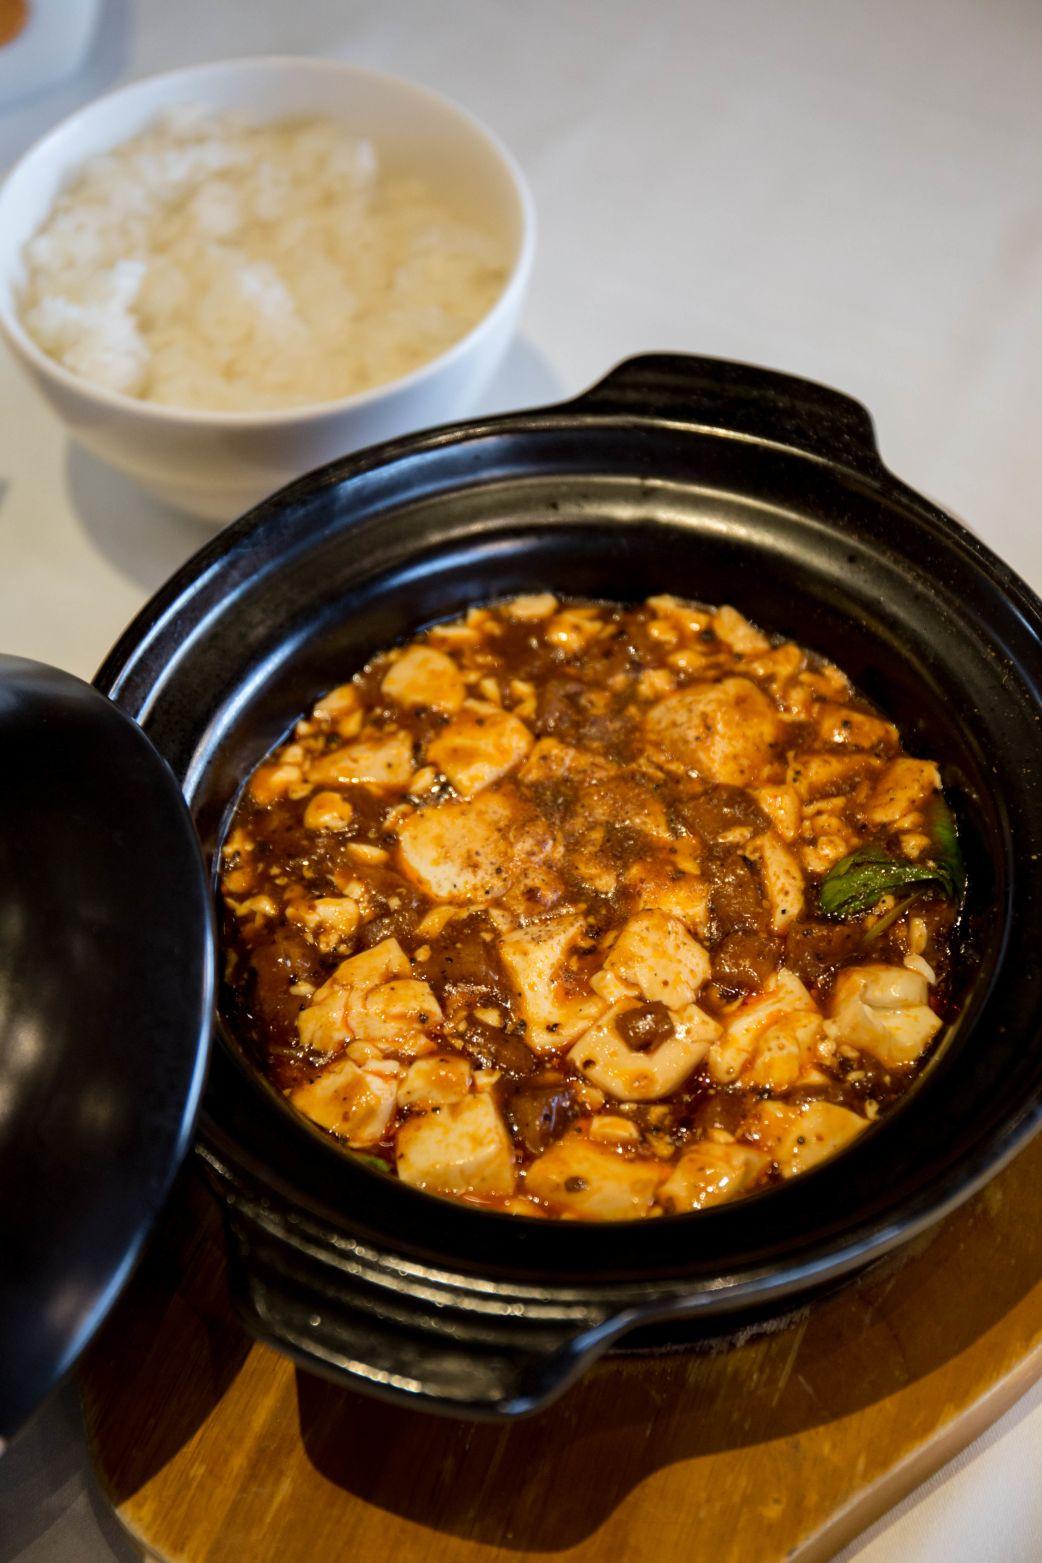 Signature Mapo Tofu